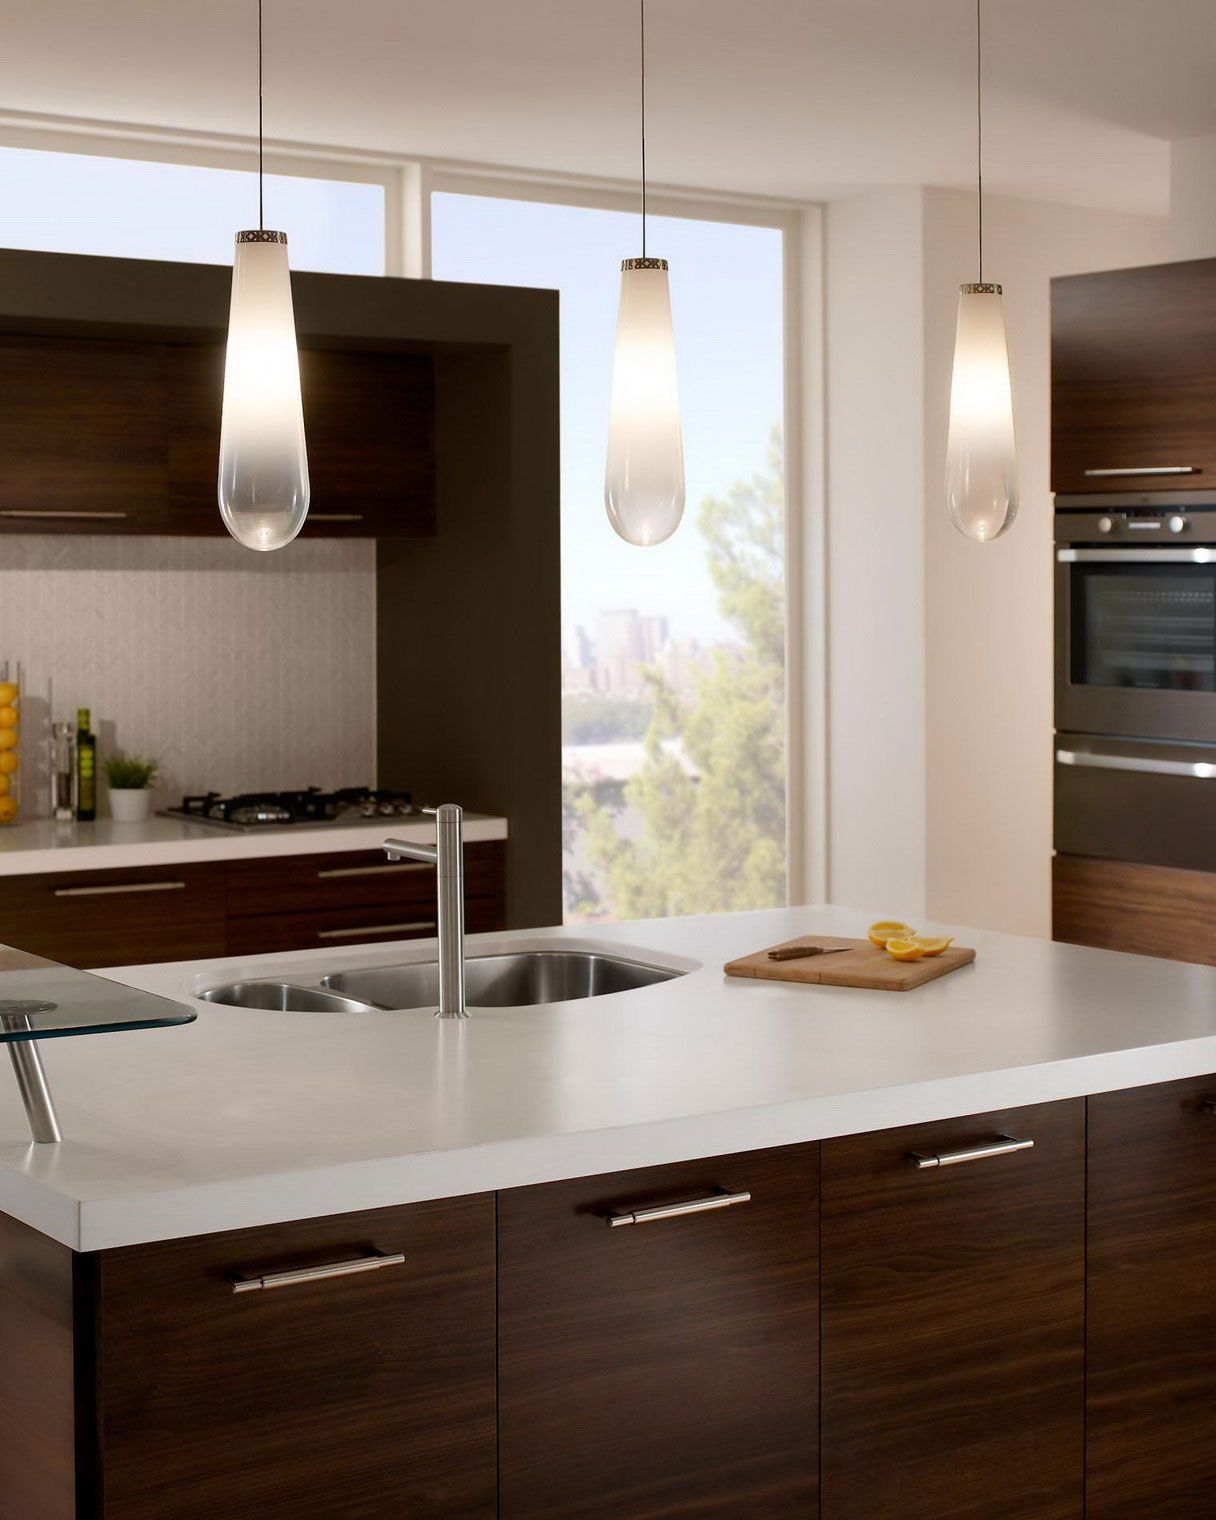 Sleek kitchen designing ideas with laminate teak kitchen island